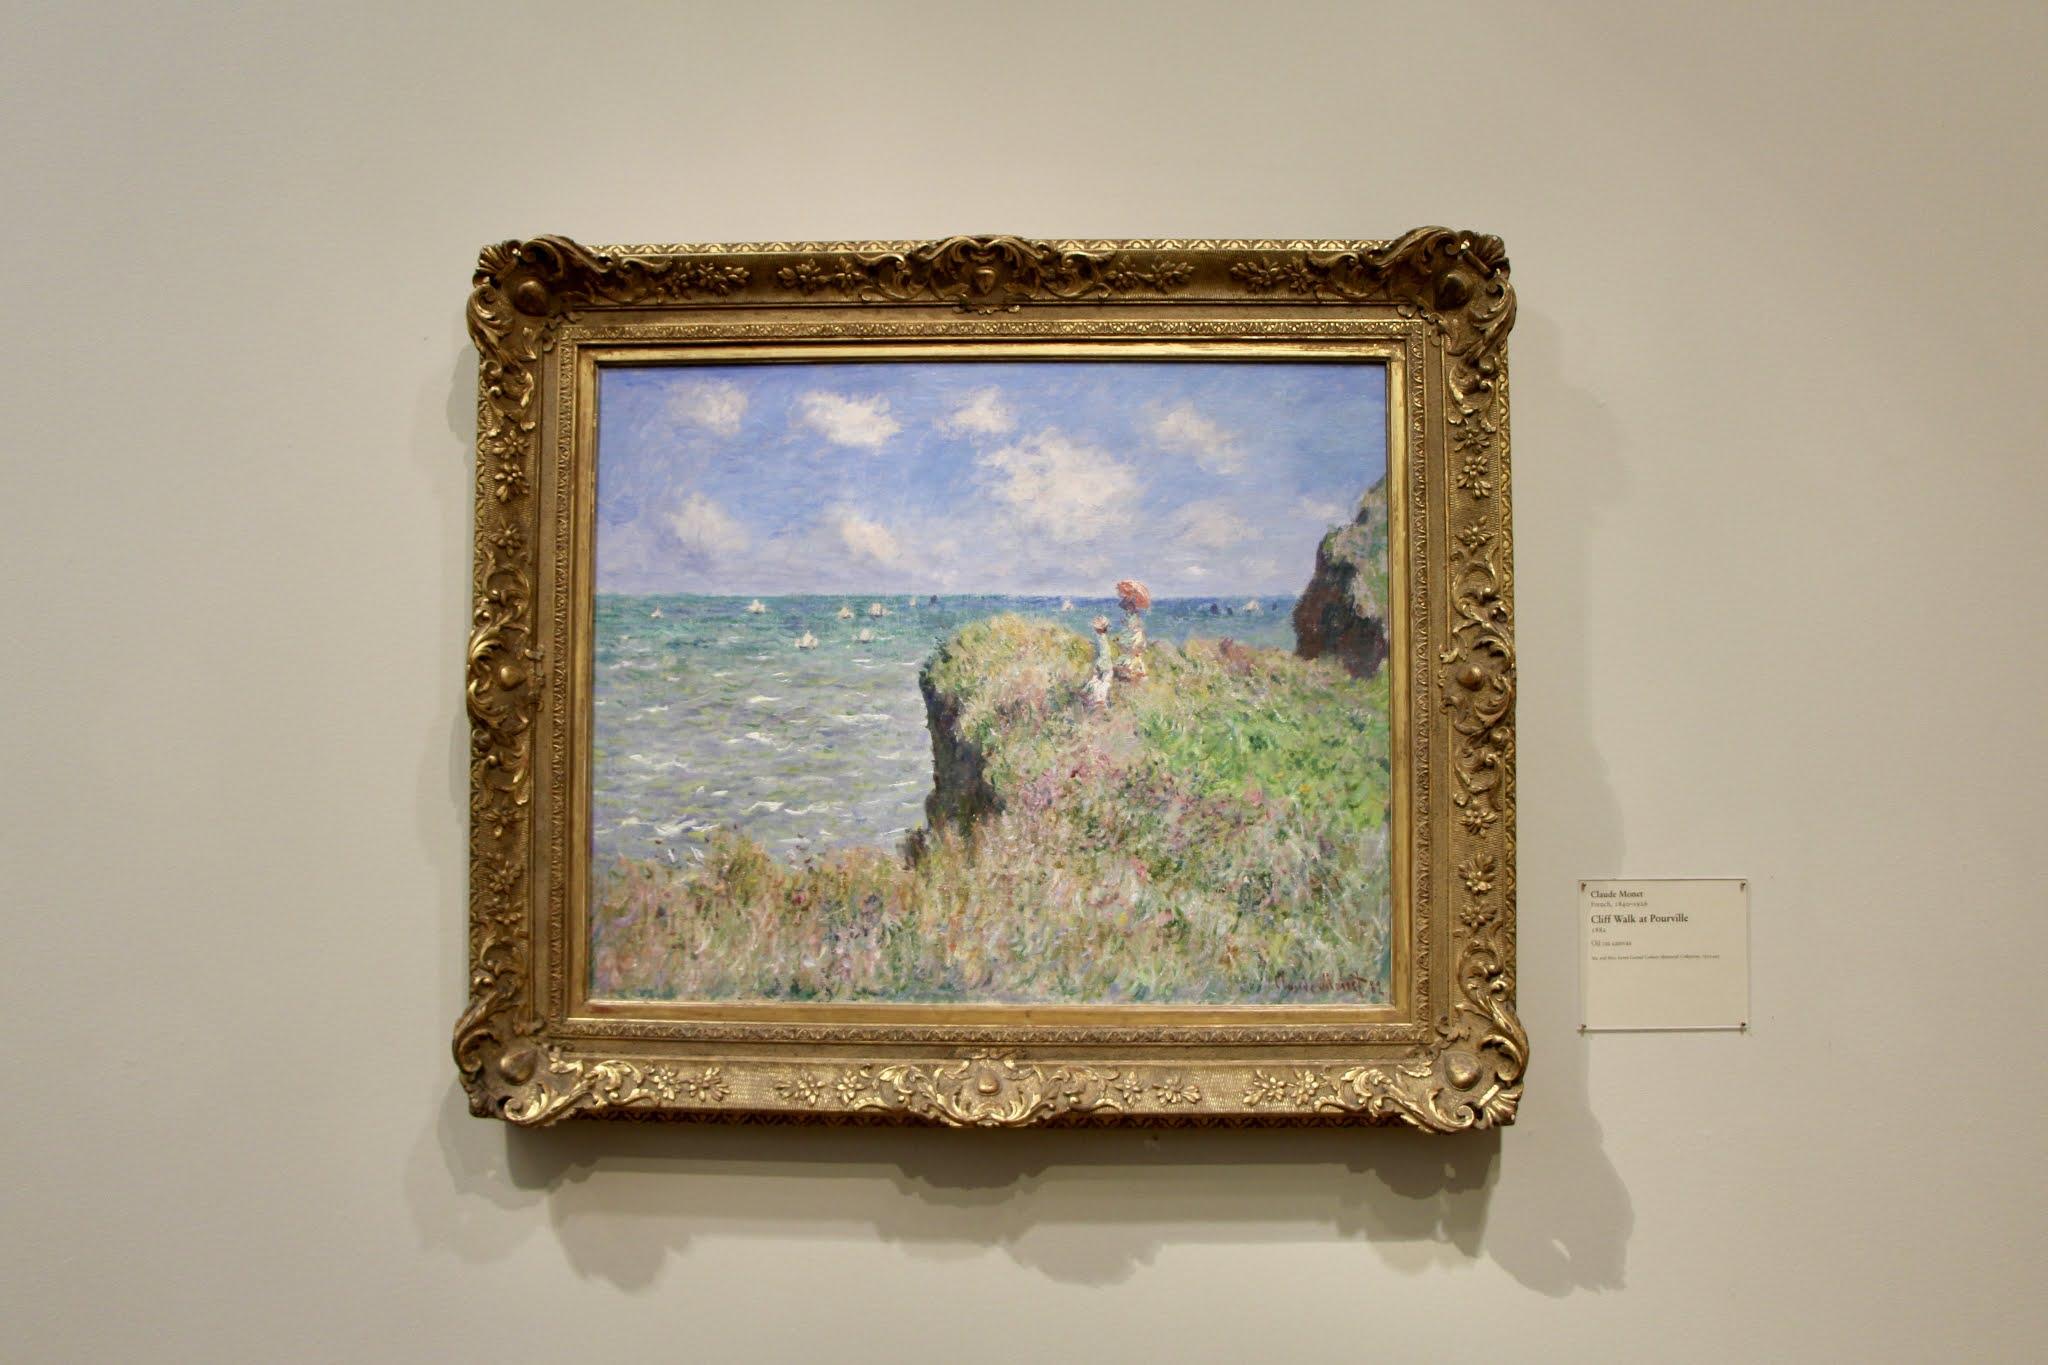 art institute, art, paintings, impressionism, chicago travel guide